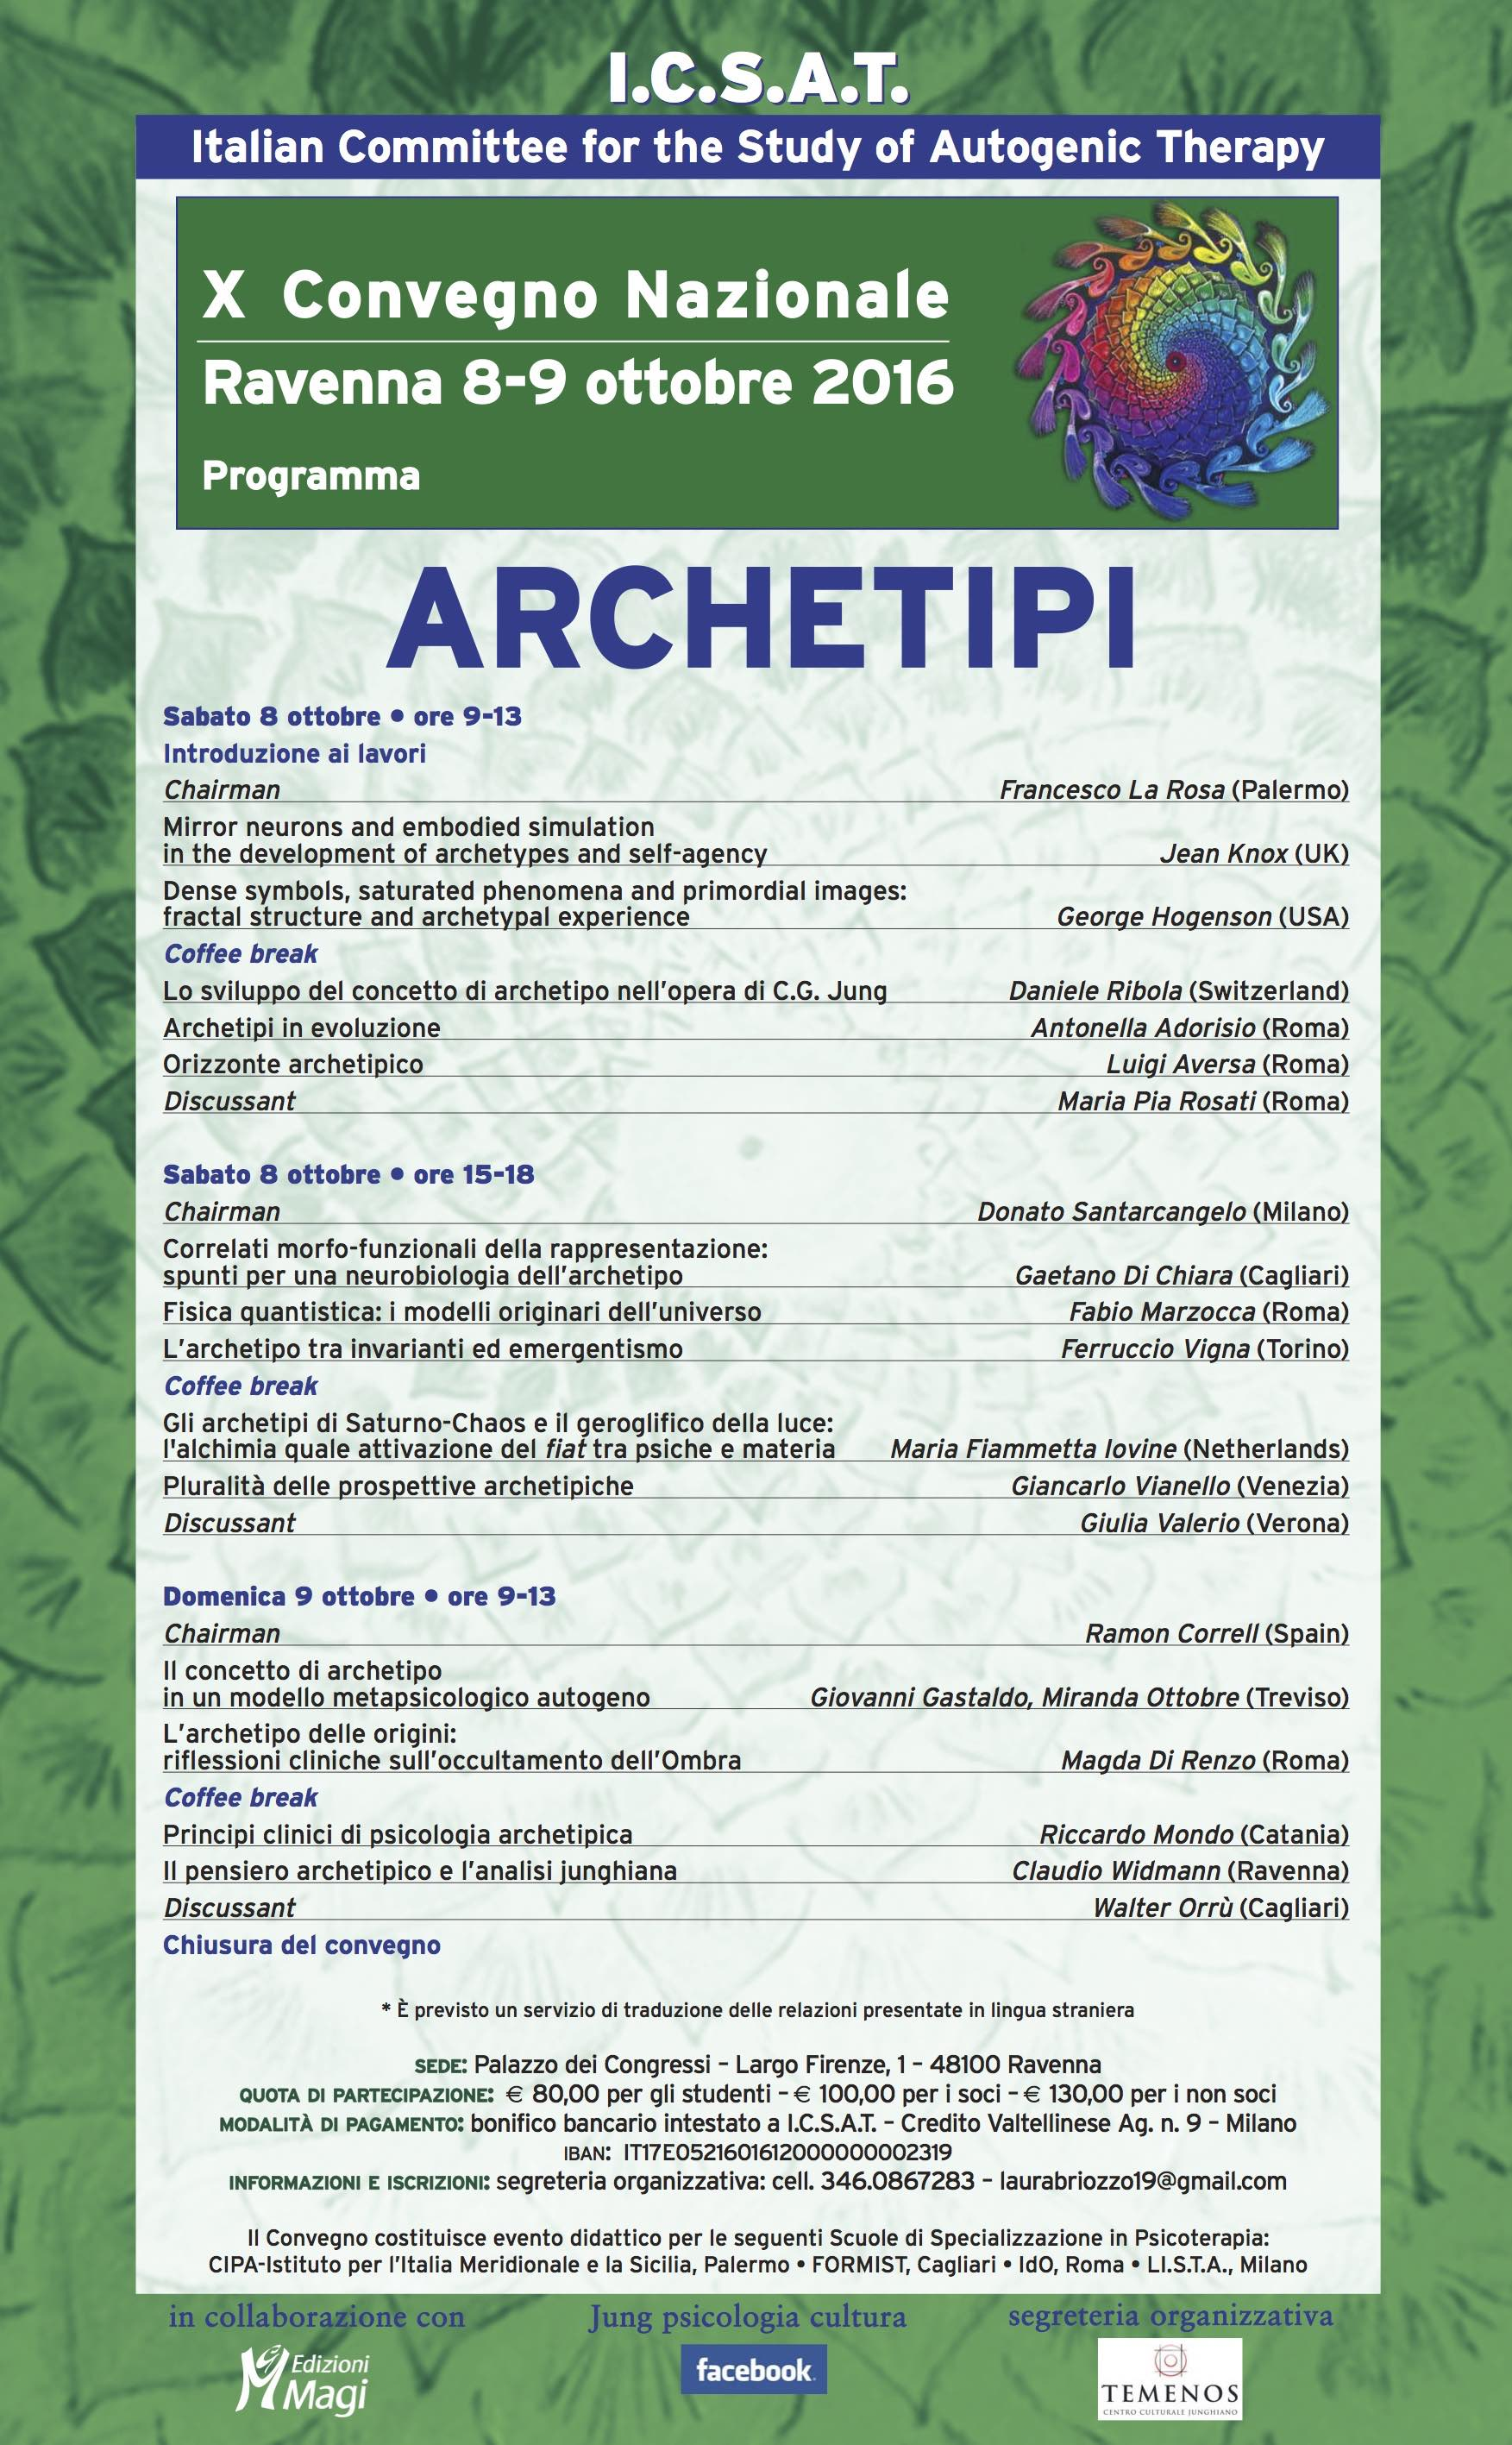 Archetipi. X Convegno nazionale ICSAT